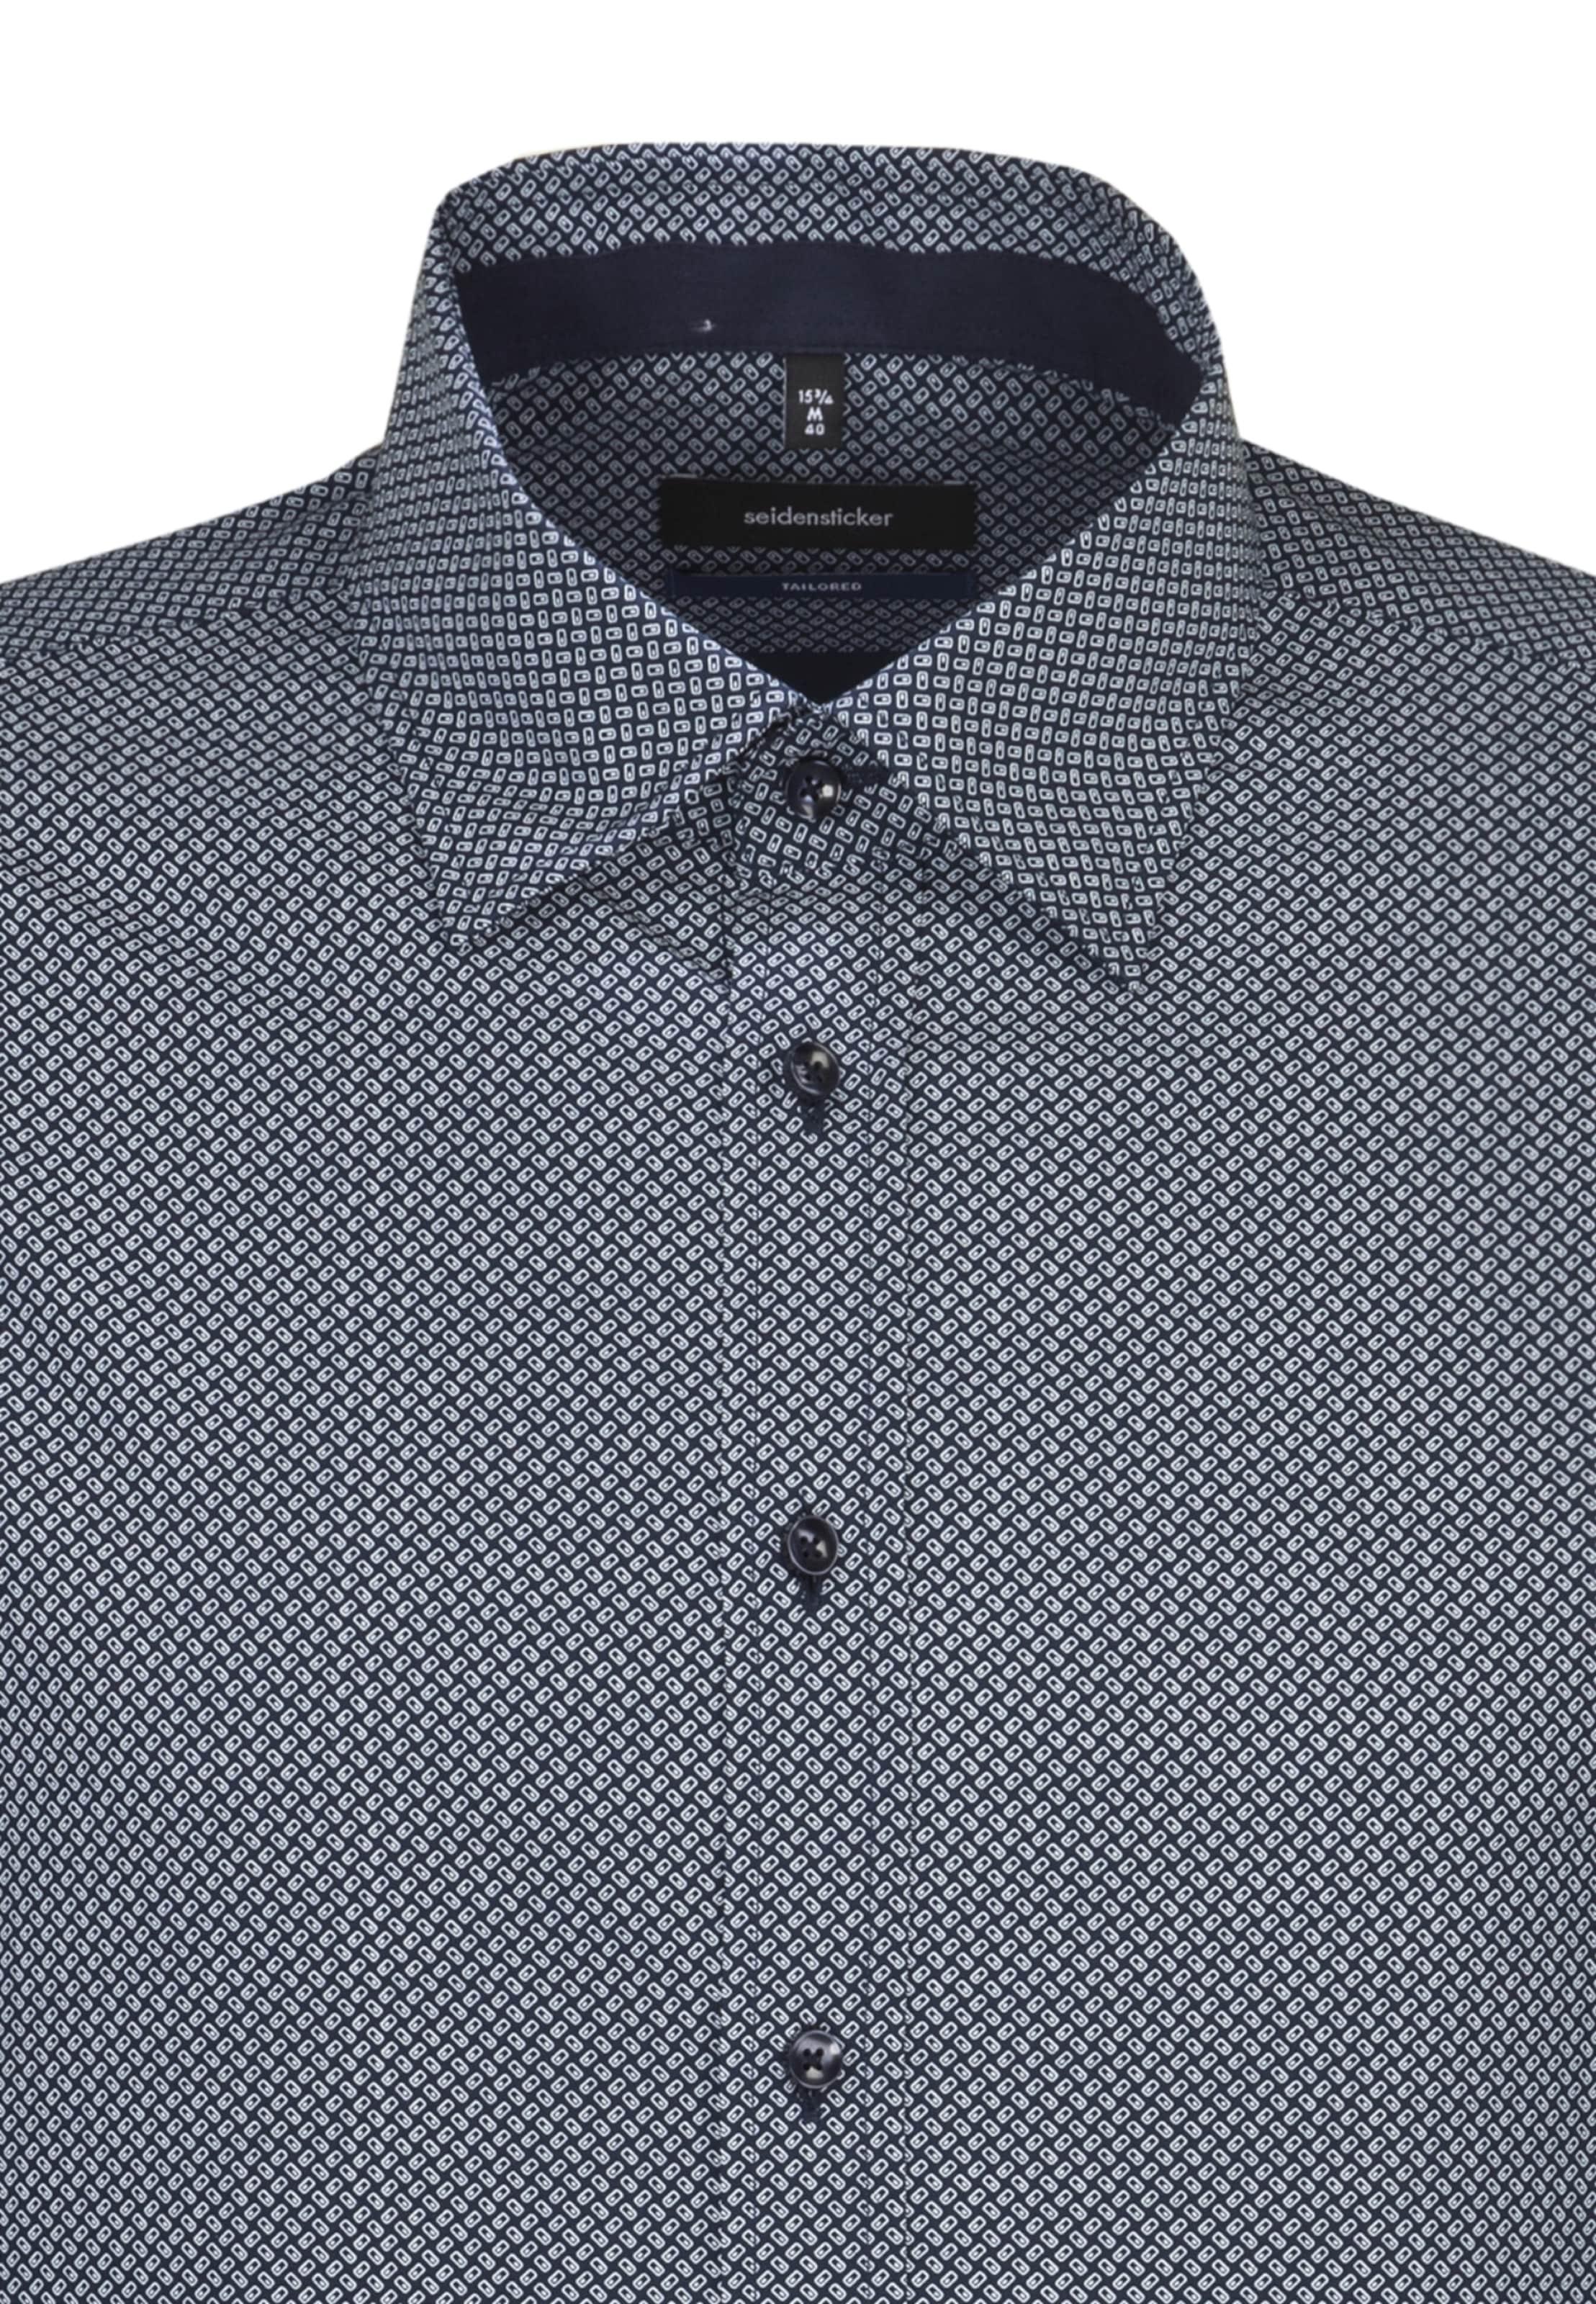 Seidensticker Business En Chemise 'tailored' gris Bleu b6gf7vYy